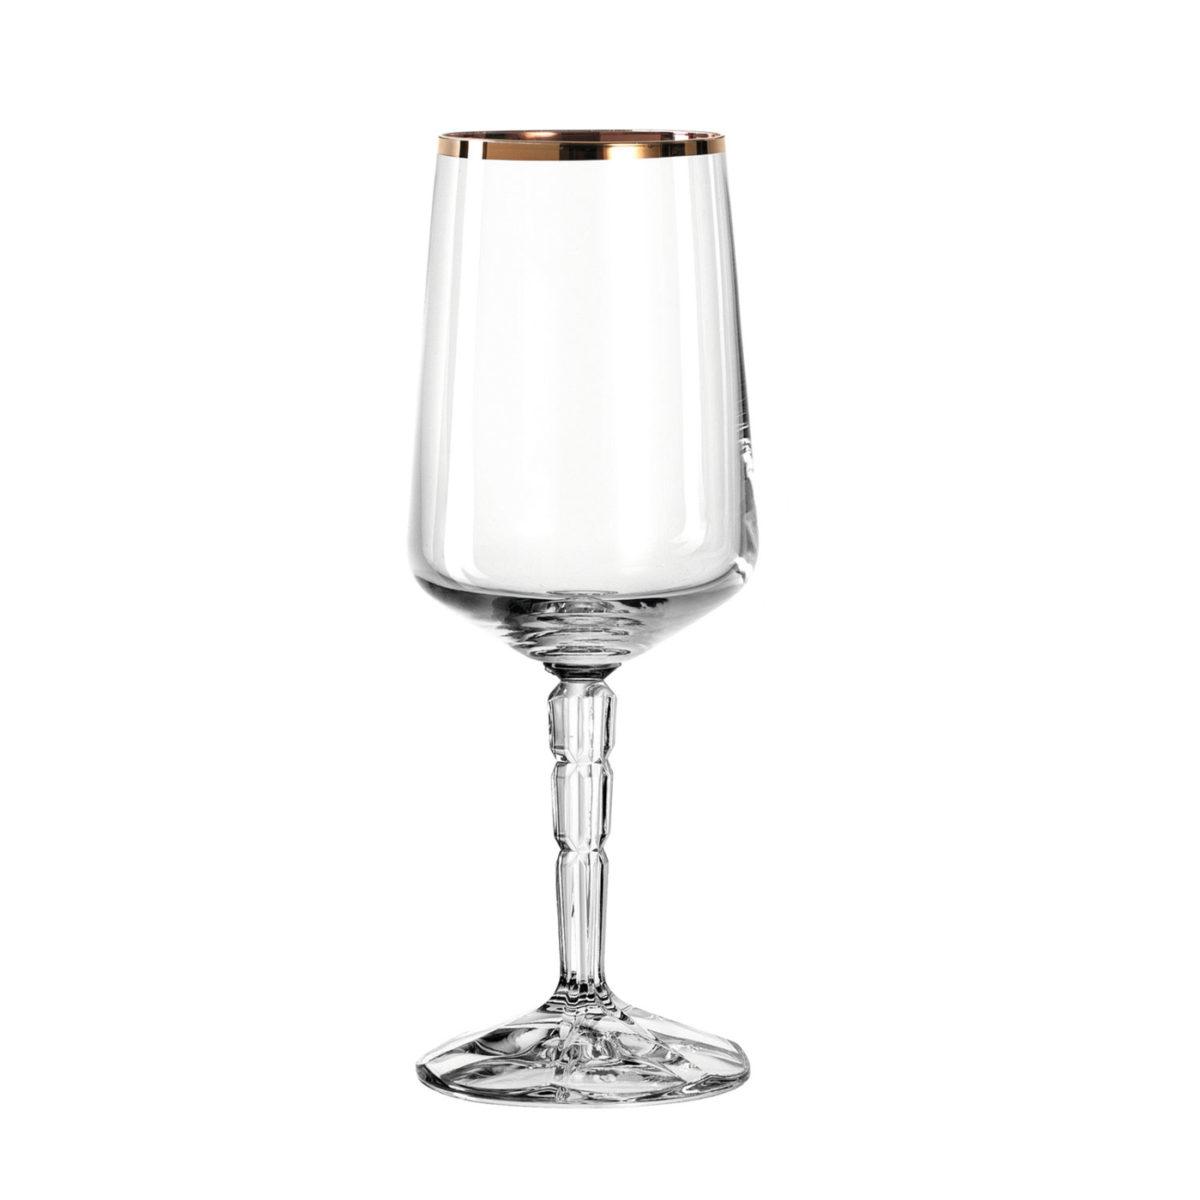 preview c81e728d9d4c2f636f067f89cc14862c 1 1200x1200 - Pahar pentru vin alb Spiritii gold (L022700)